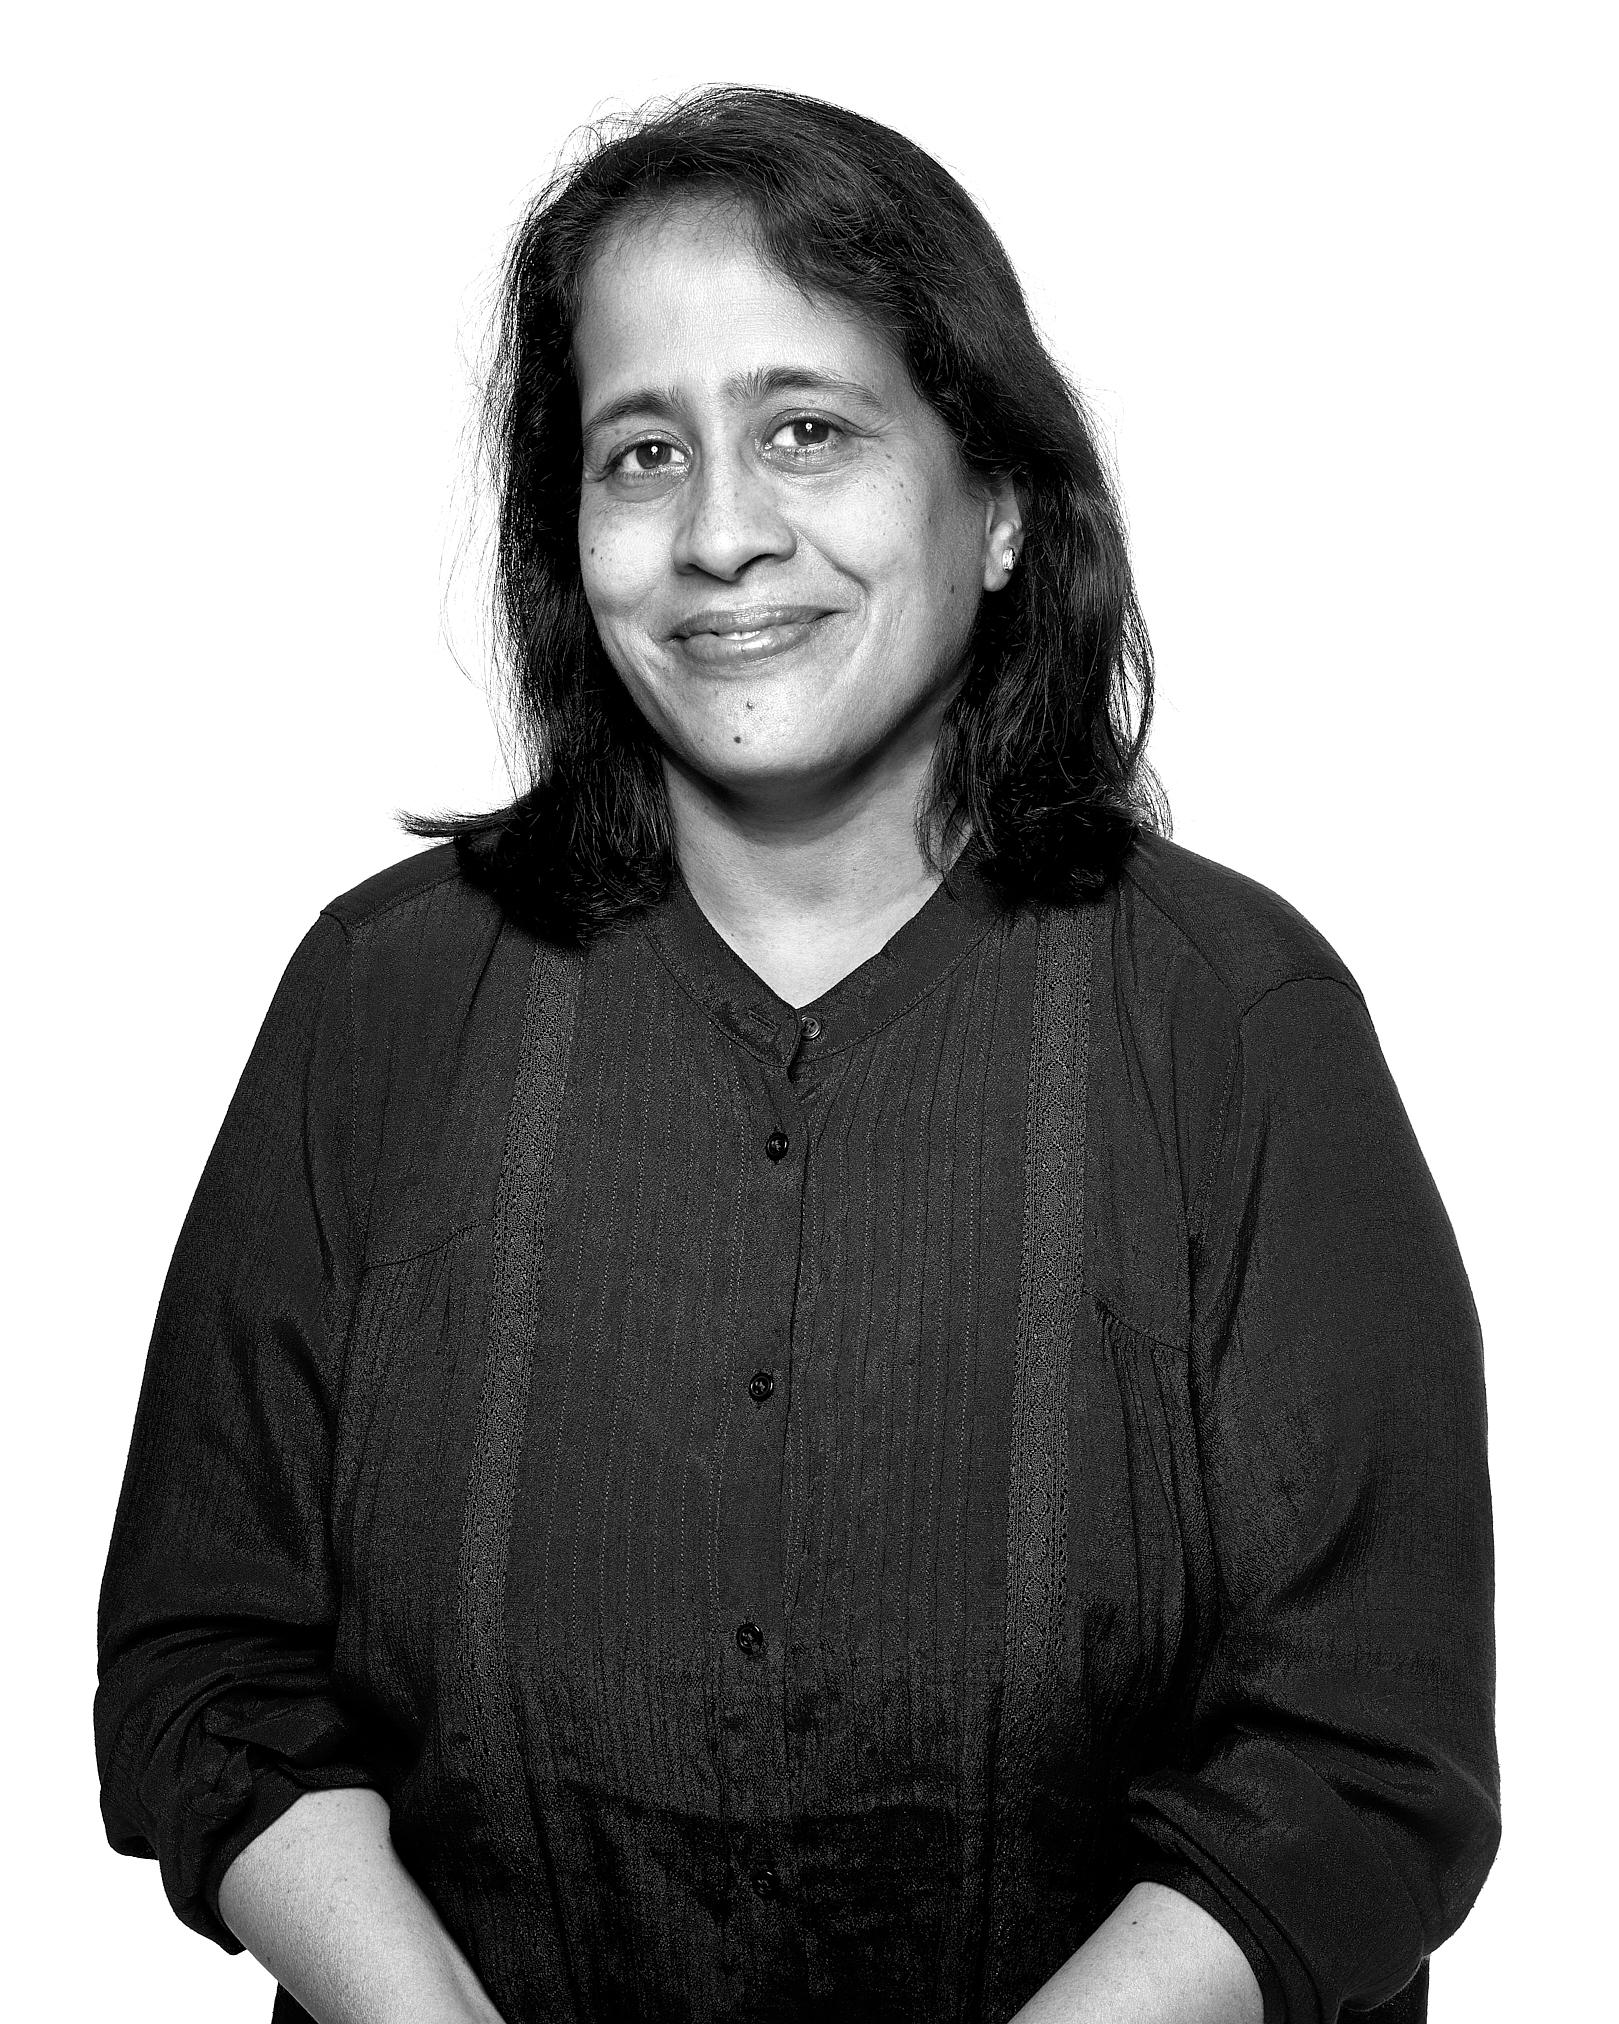 Alolita Sharma by Peter Adams.